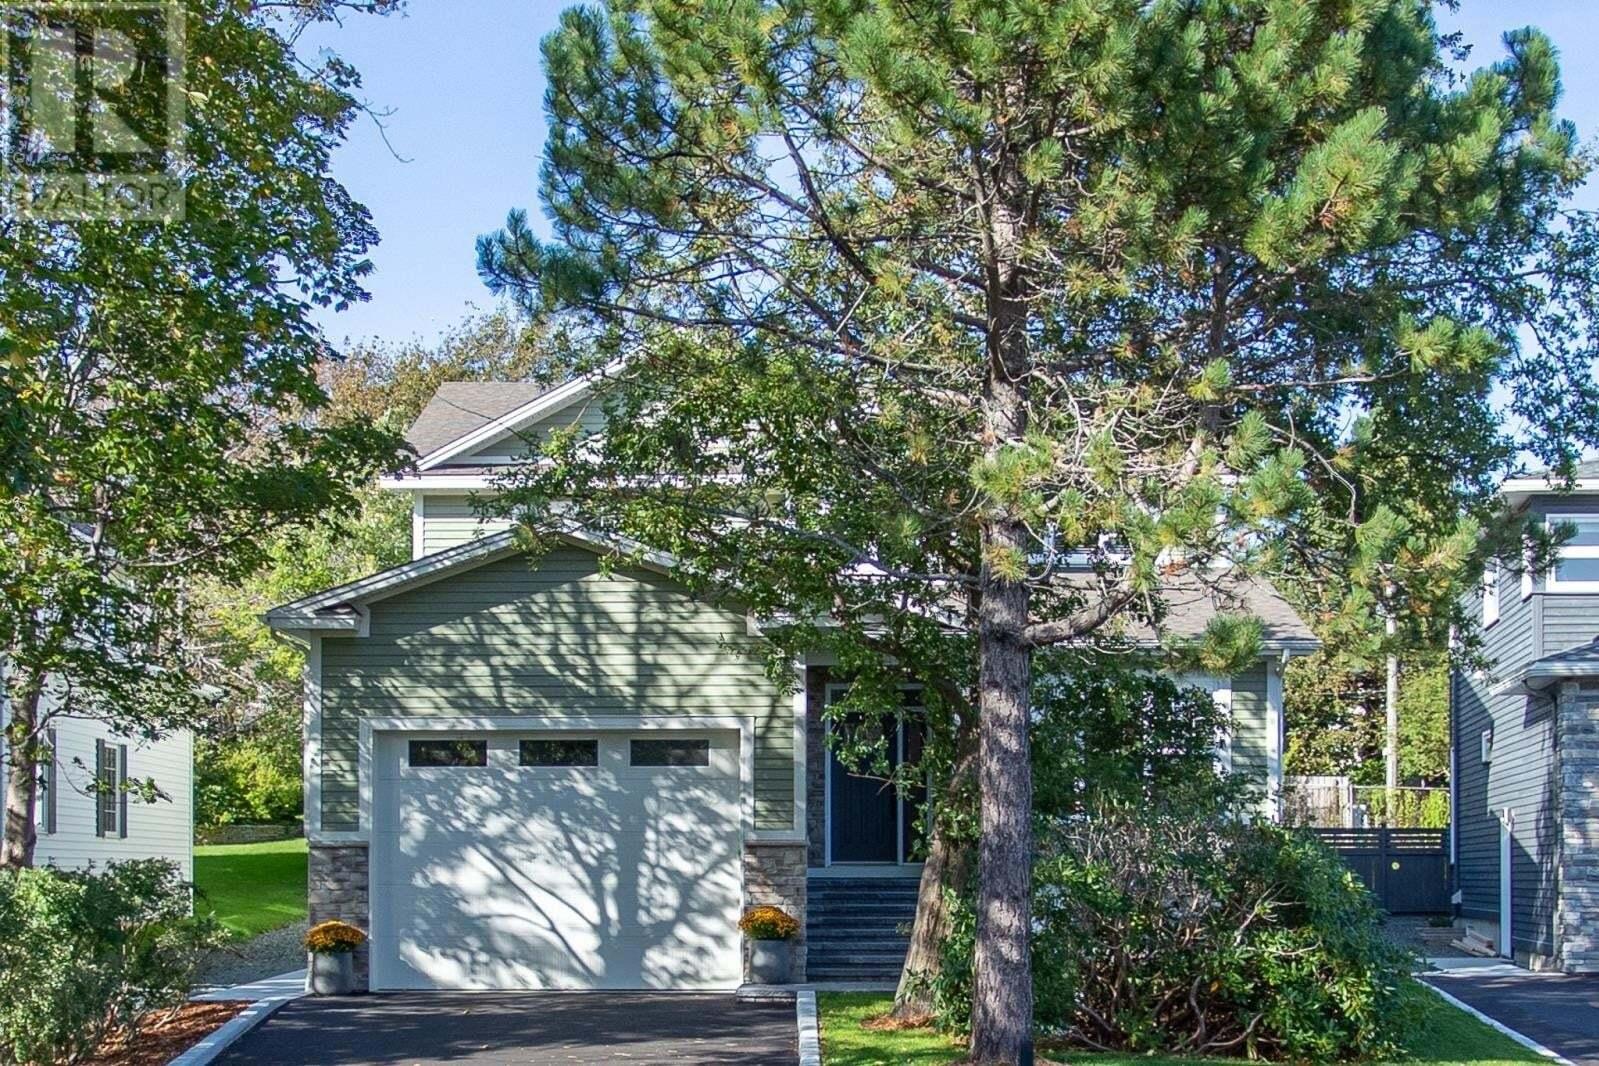 House for sale at 28 Rostellan Pl St. John's Newfoundland - MLS: 1222521